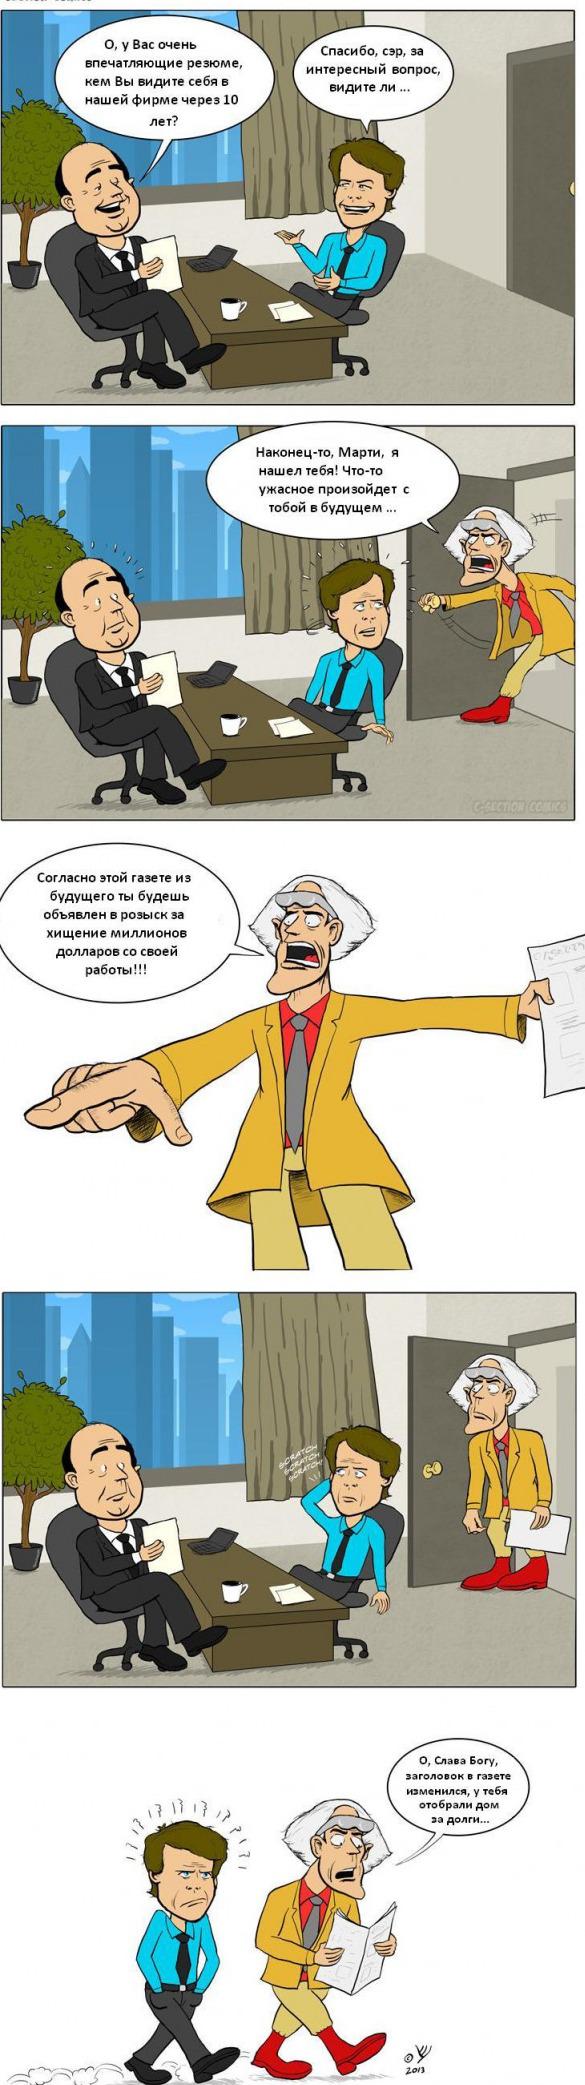 Смешные комиксы BroDude.ru brodude.ru, 11.07.2013, sdf6UrHdeMMgOOQd3rKqsZuMtN99cpQF